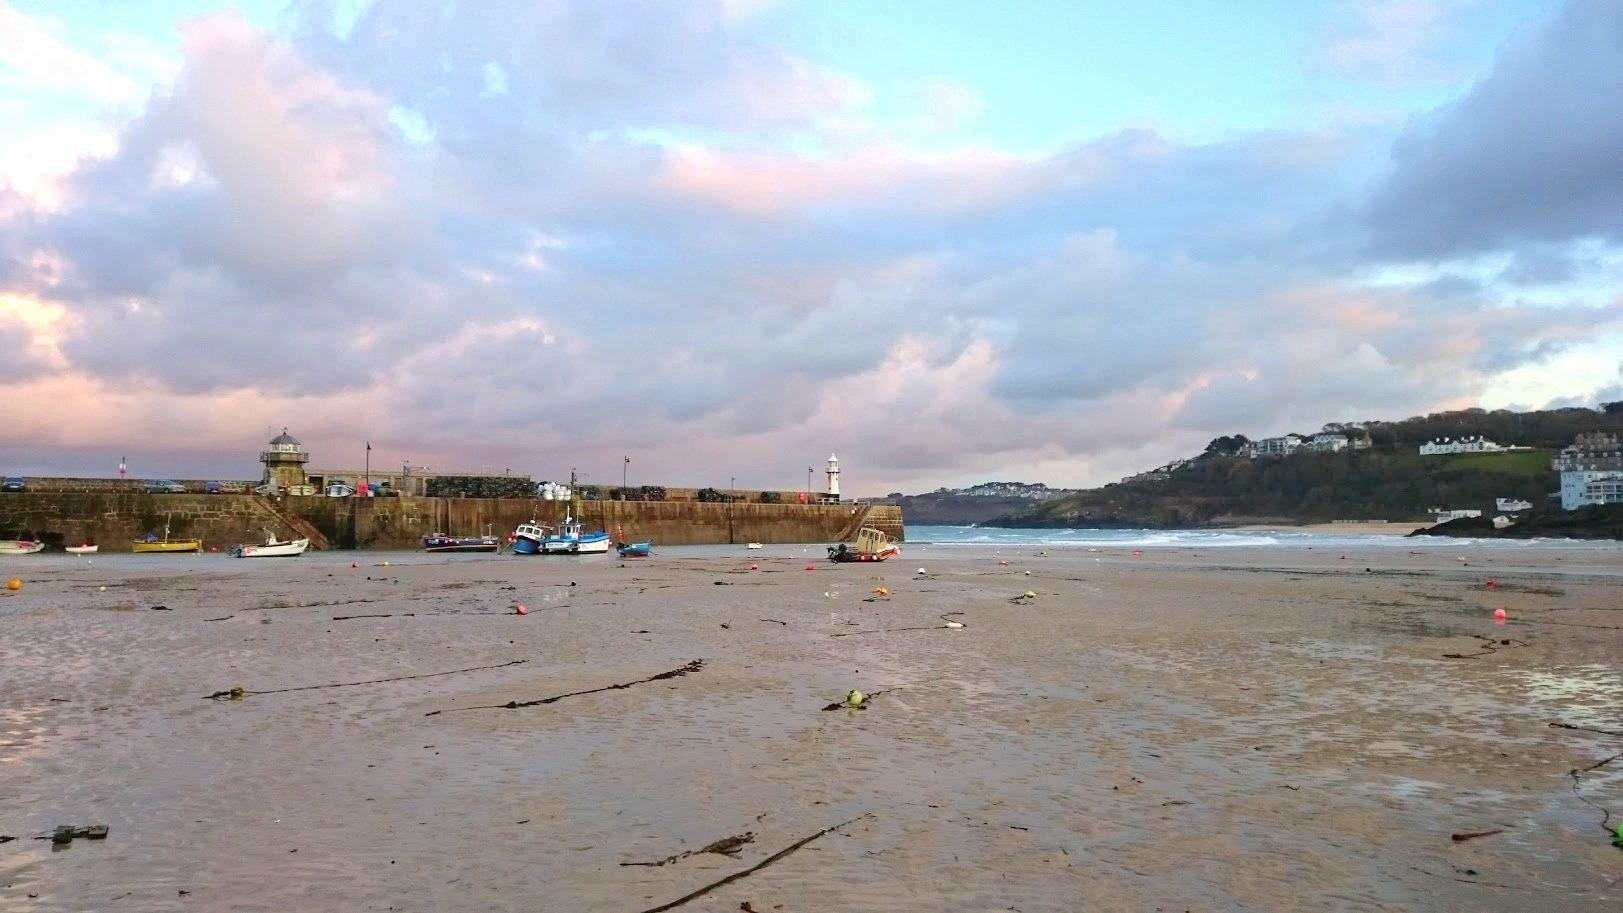 Cornwall rannikko kokemuksia st ives